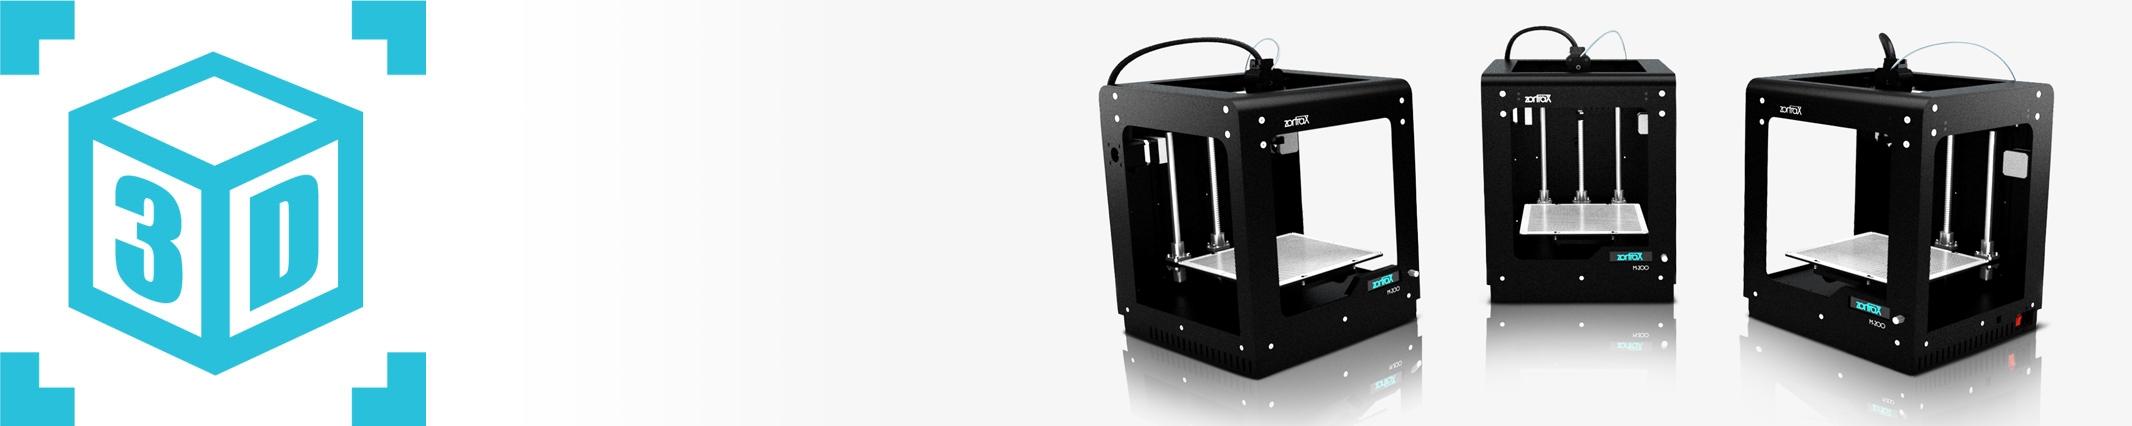 Prototypowanie | druk 3D | Visual Image